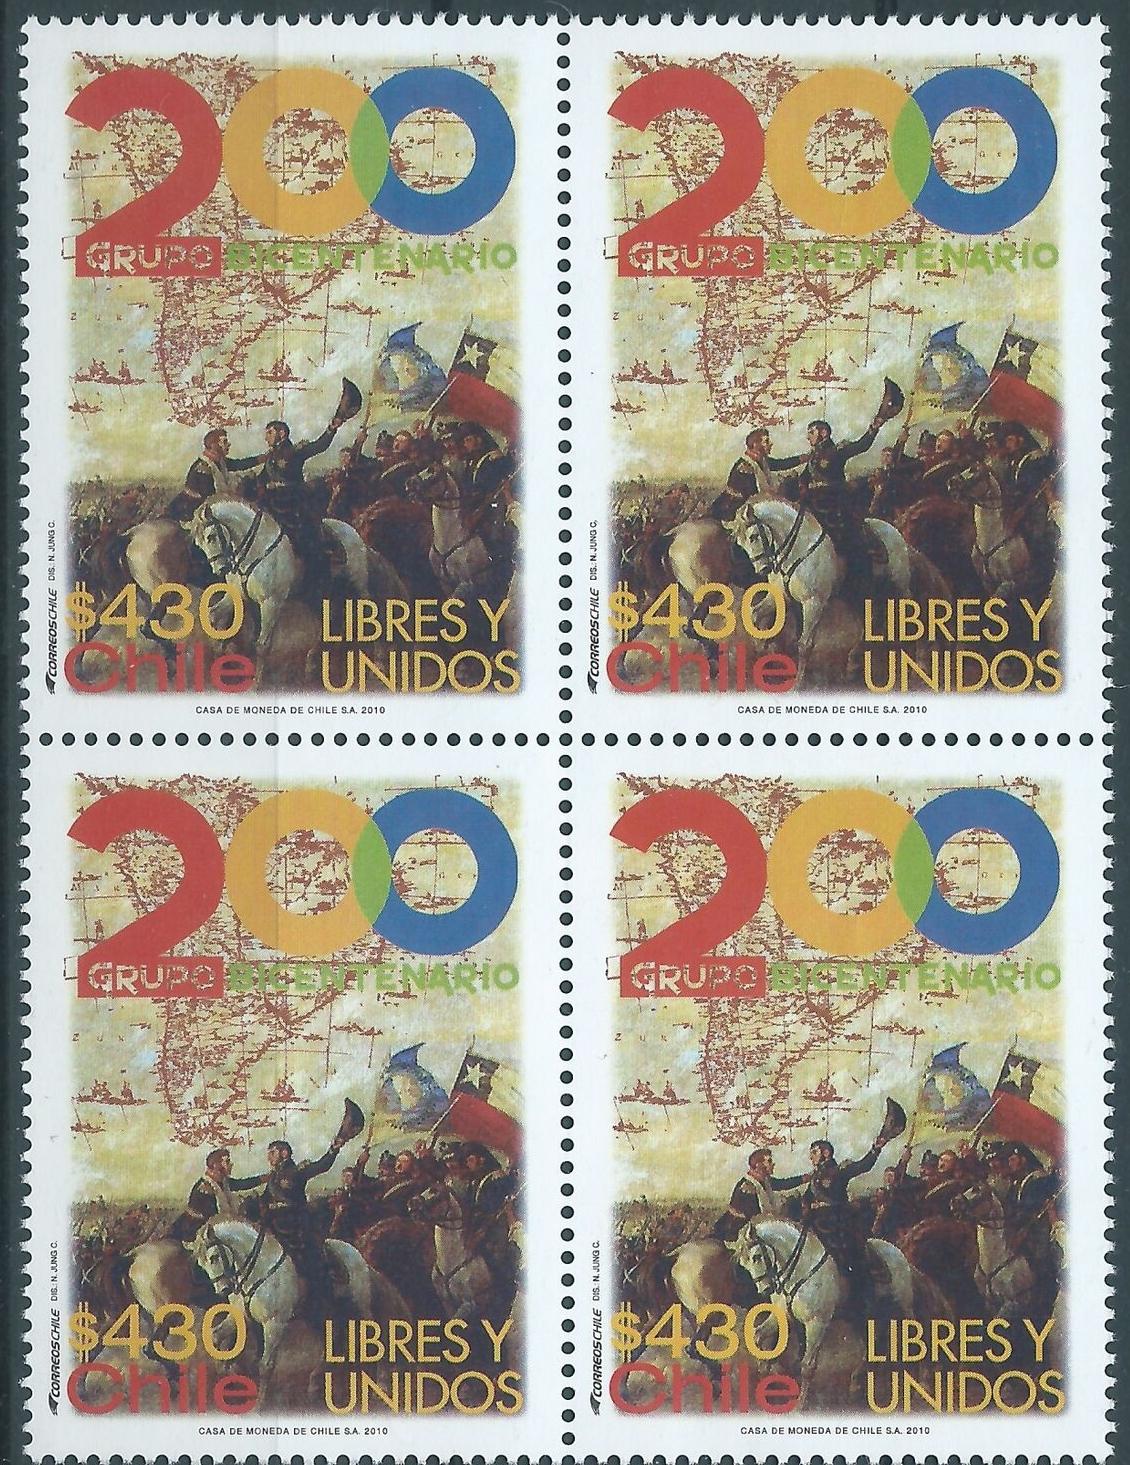 Chile - Scott #1555 (2010) block of 4